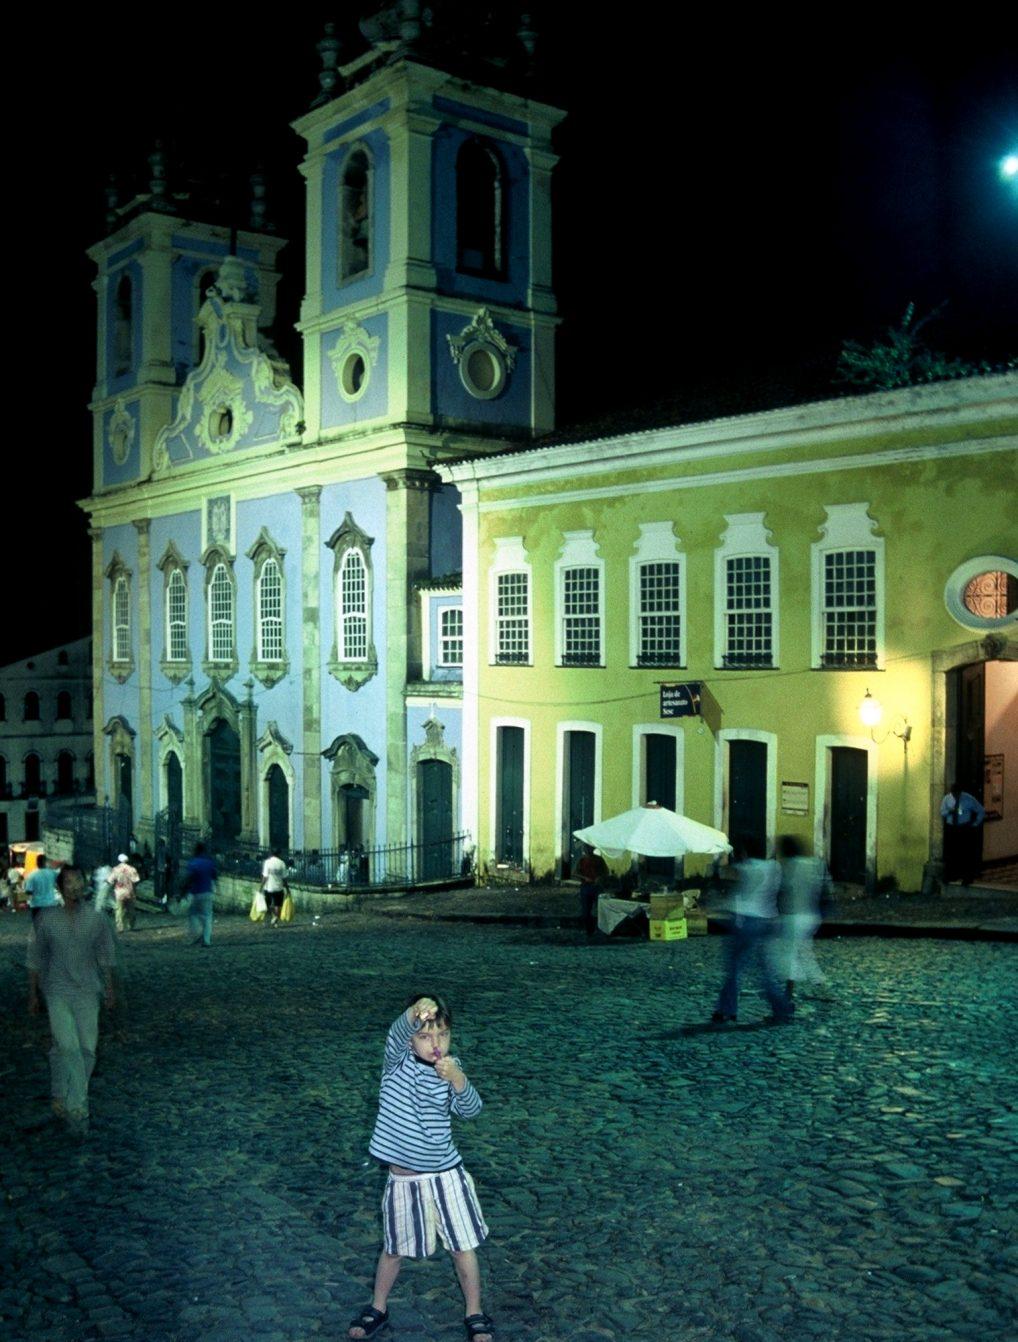 Salvador da Bahia : Church of Our Lady of the Rosary of the Blacks